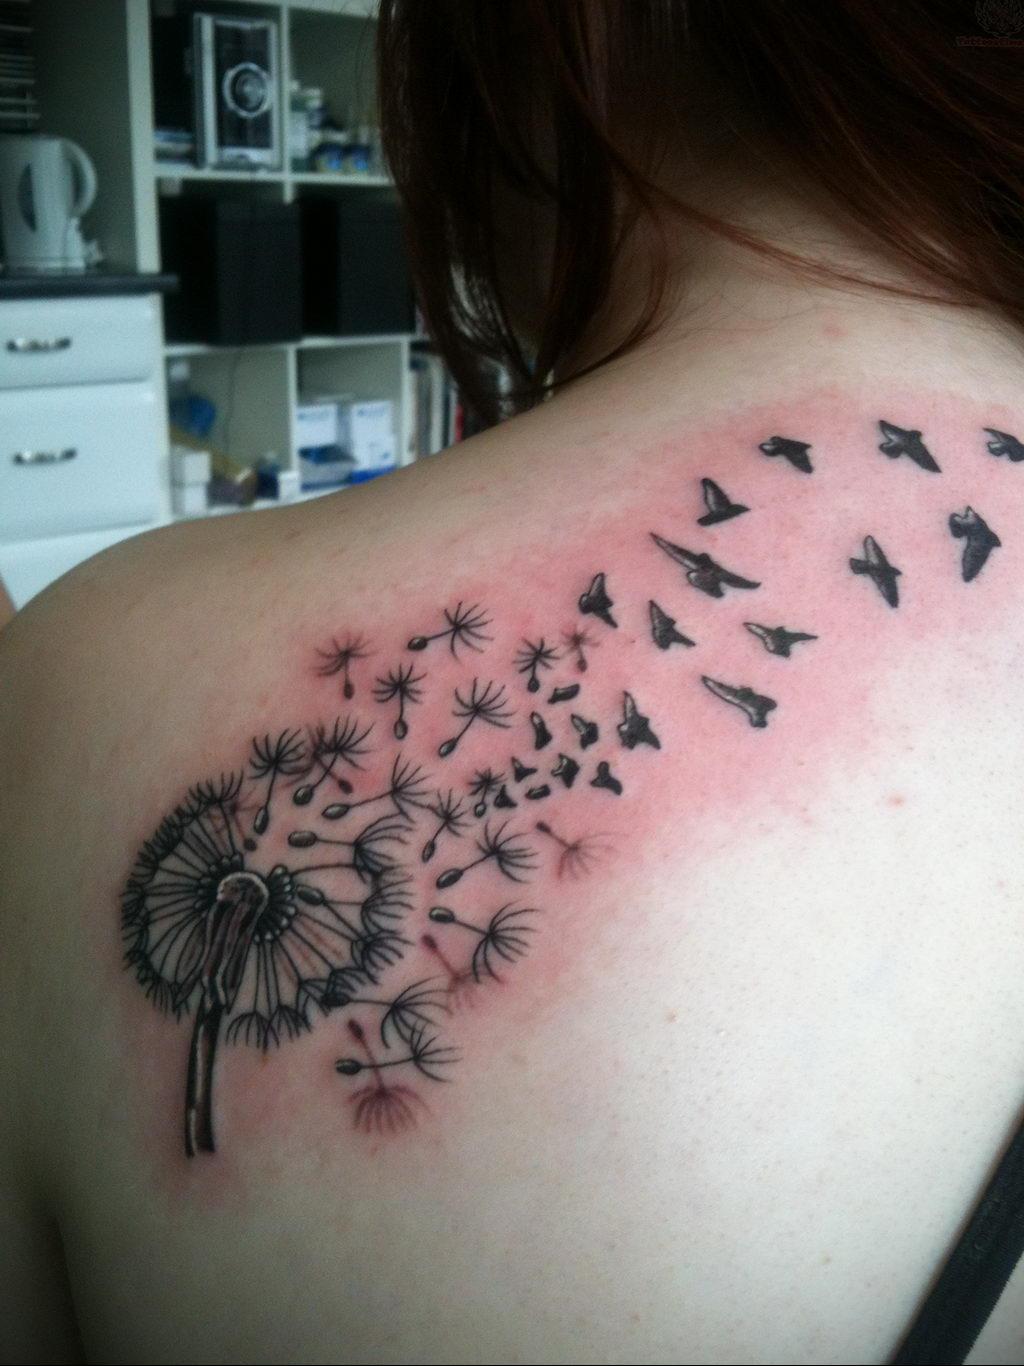 Фото тату про любовь рисунок Птица 03.02.2020 №238 -bird tattoo- tatufoto.com